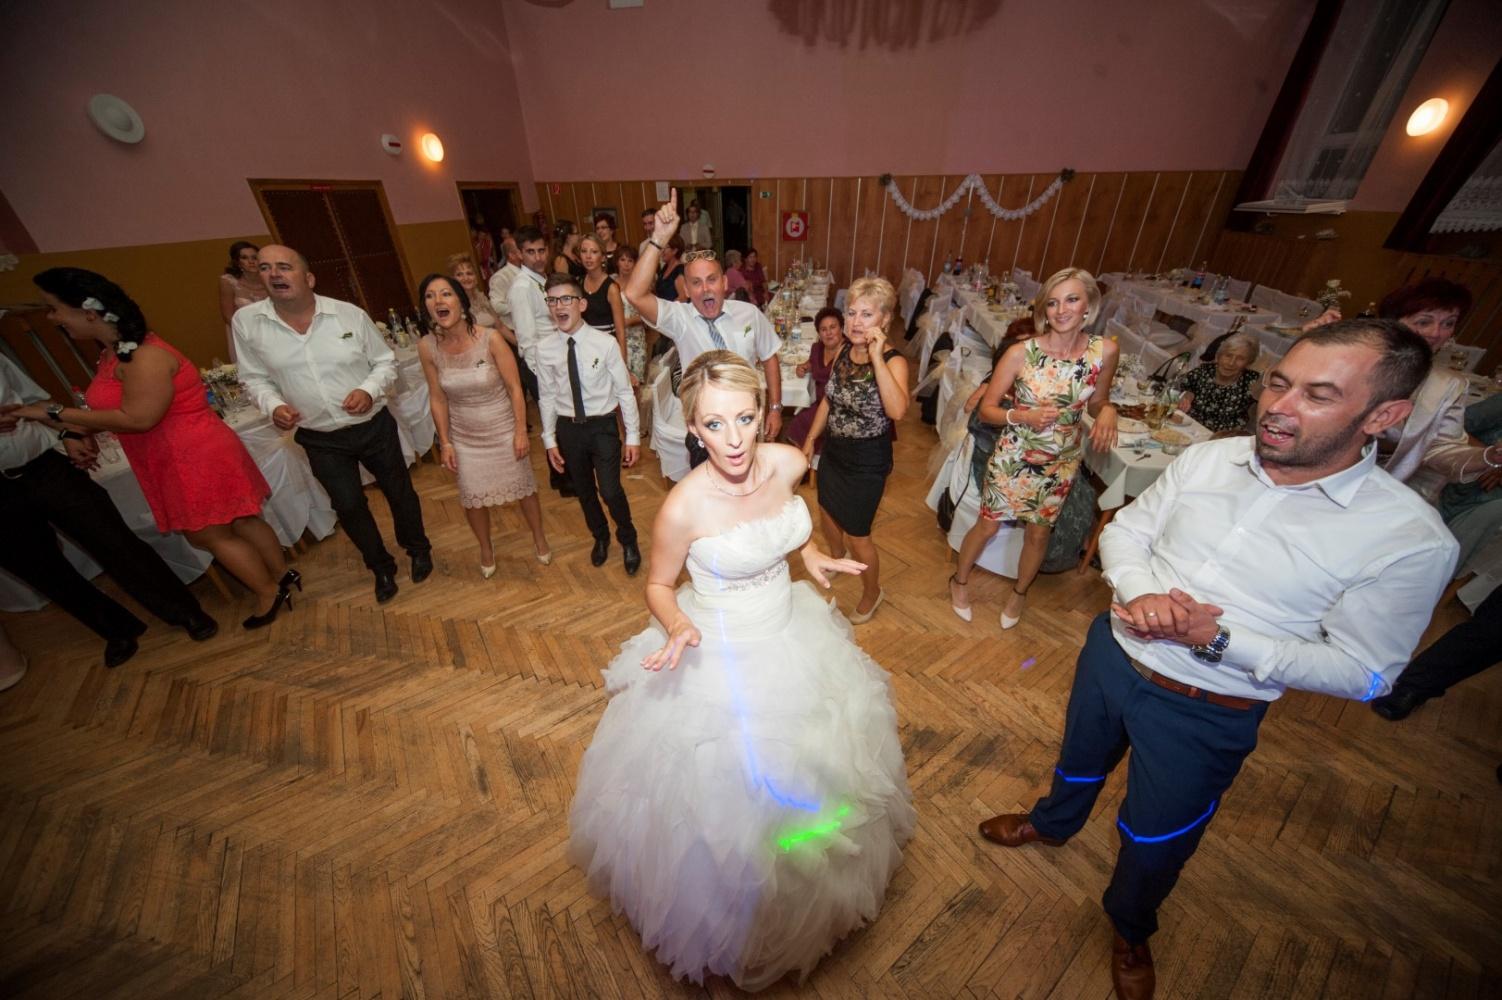 http://www.fotoz.sk/images/gallery-21/normal/svadobne-fotenie_eskuvoi-fotos_271.jpg